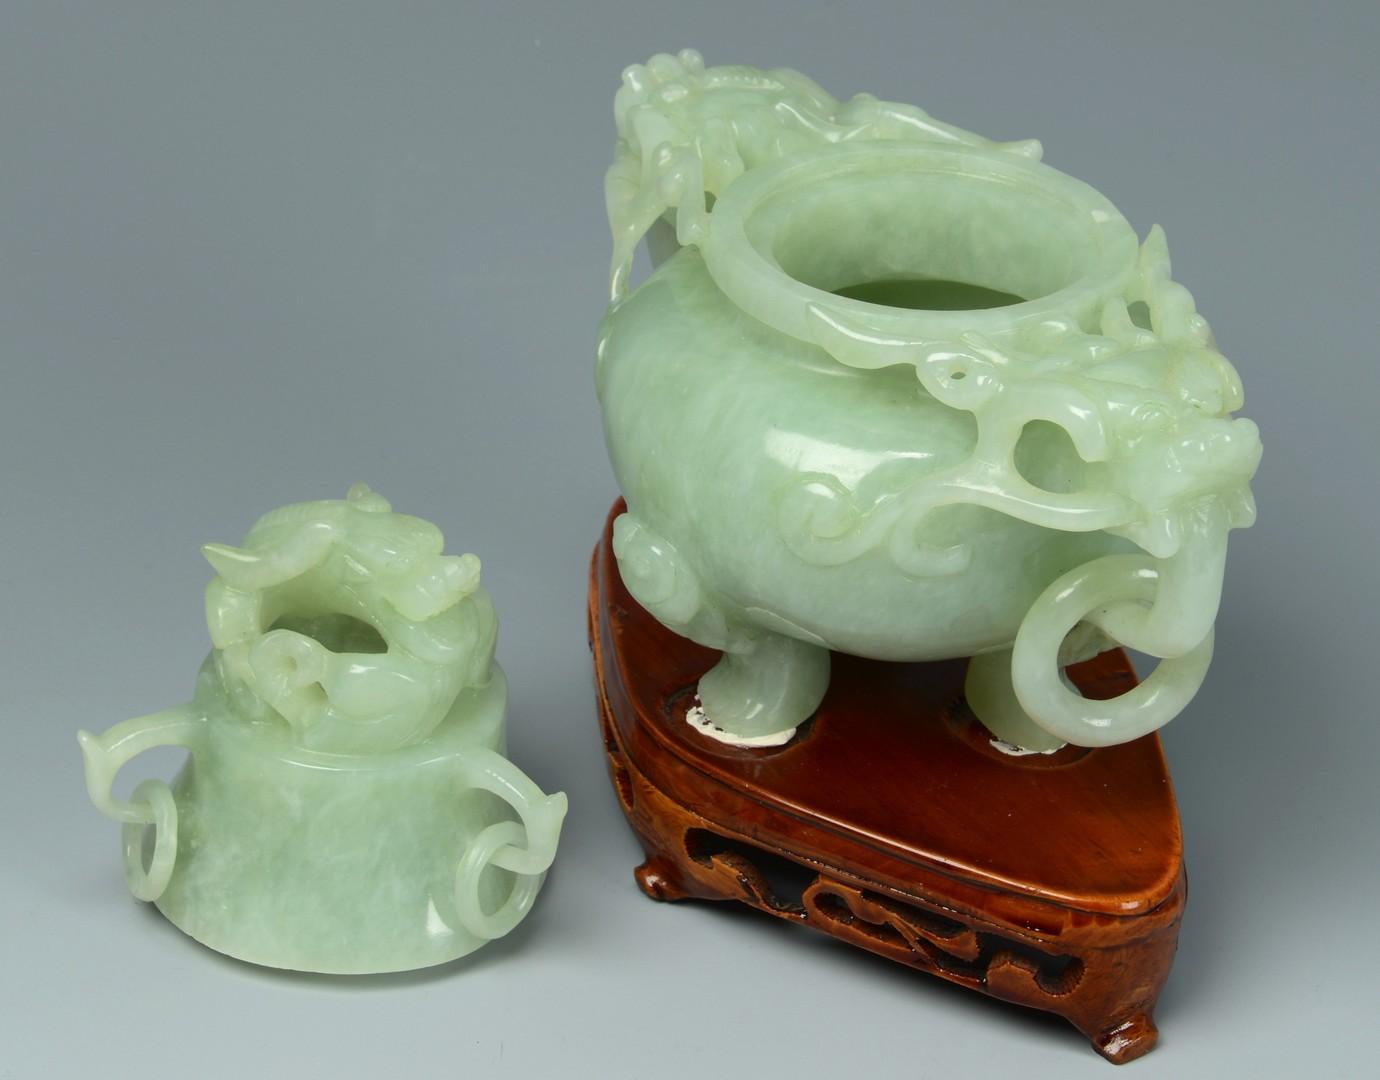 Lot 3383251: Chinese Hardstone Censer, Elephants and Tree